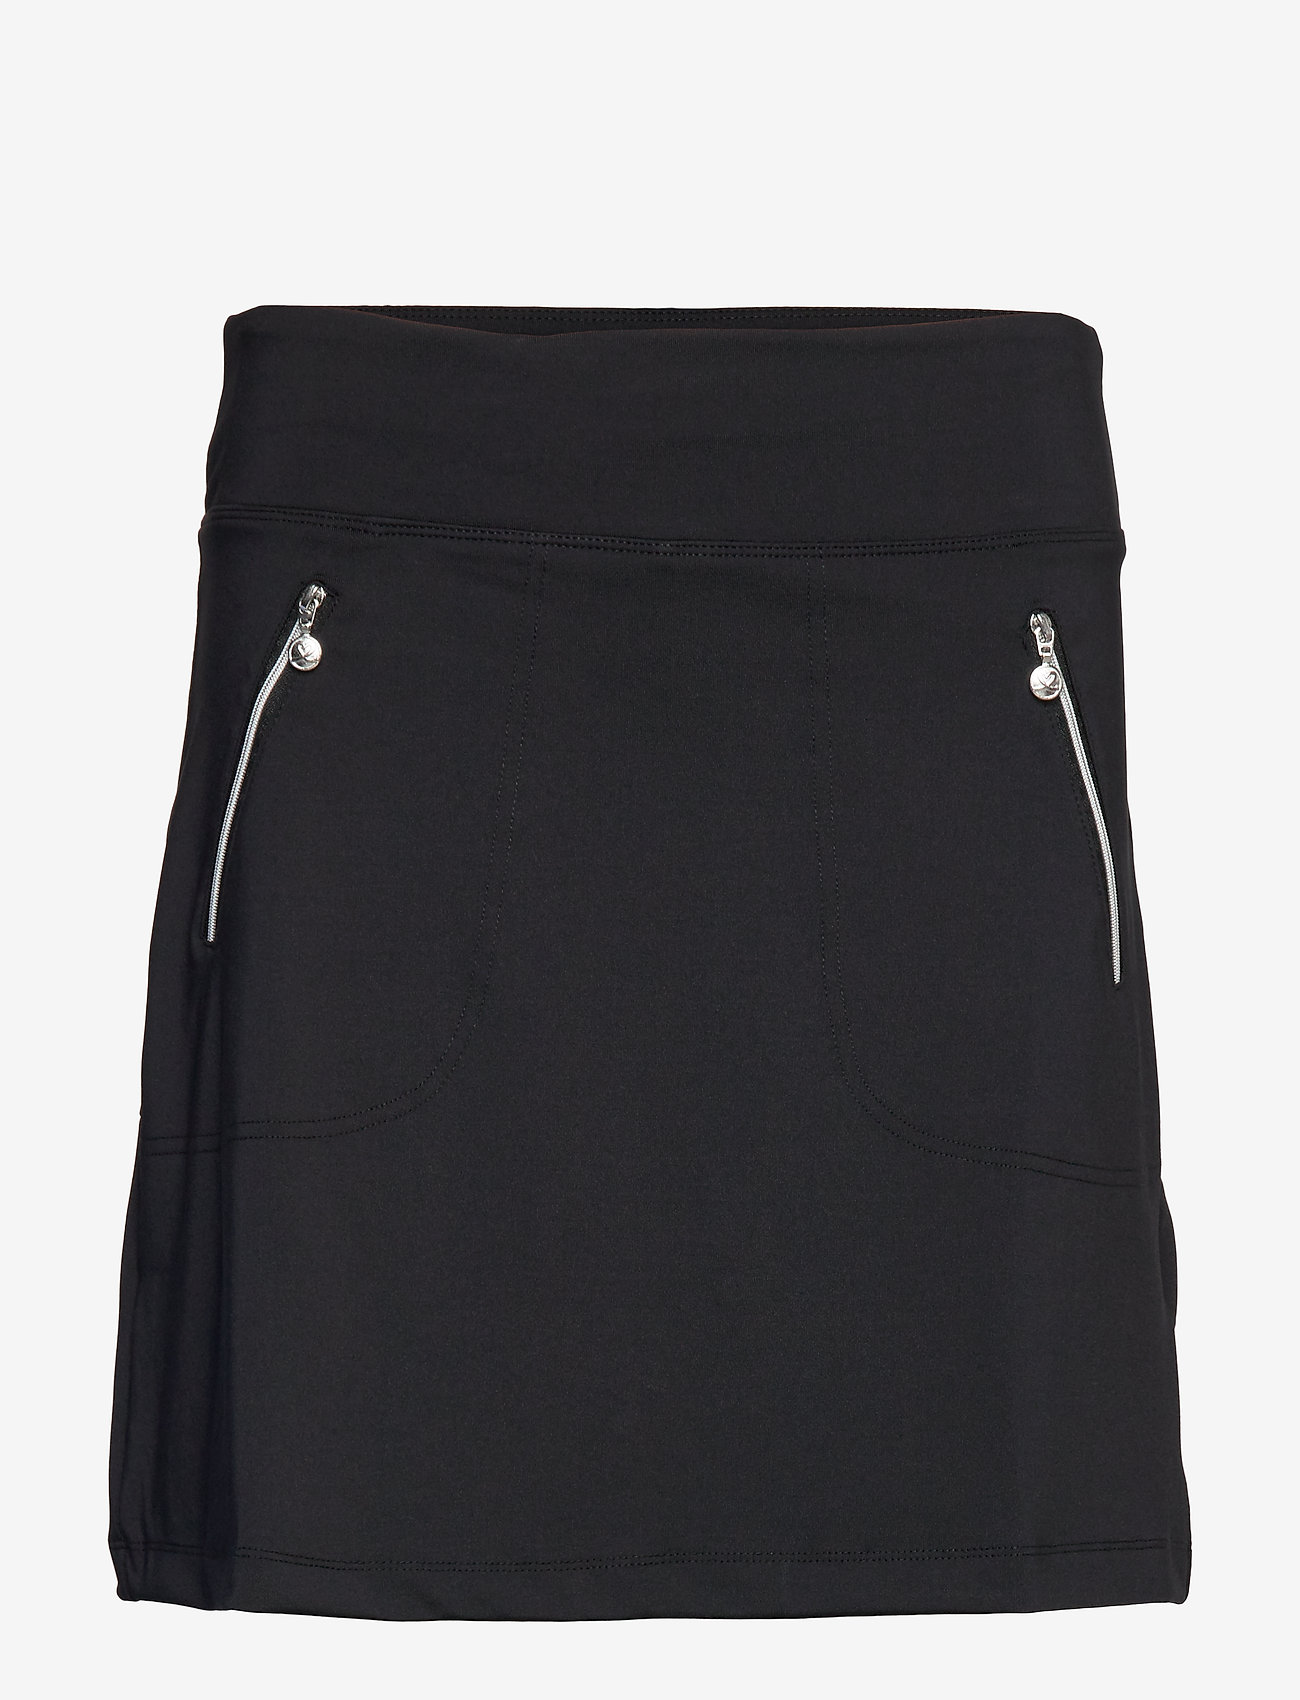 Daily Sports - MADGE SKORT 45 CM - sports skirts - black - 1